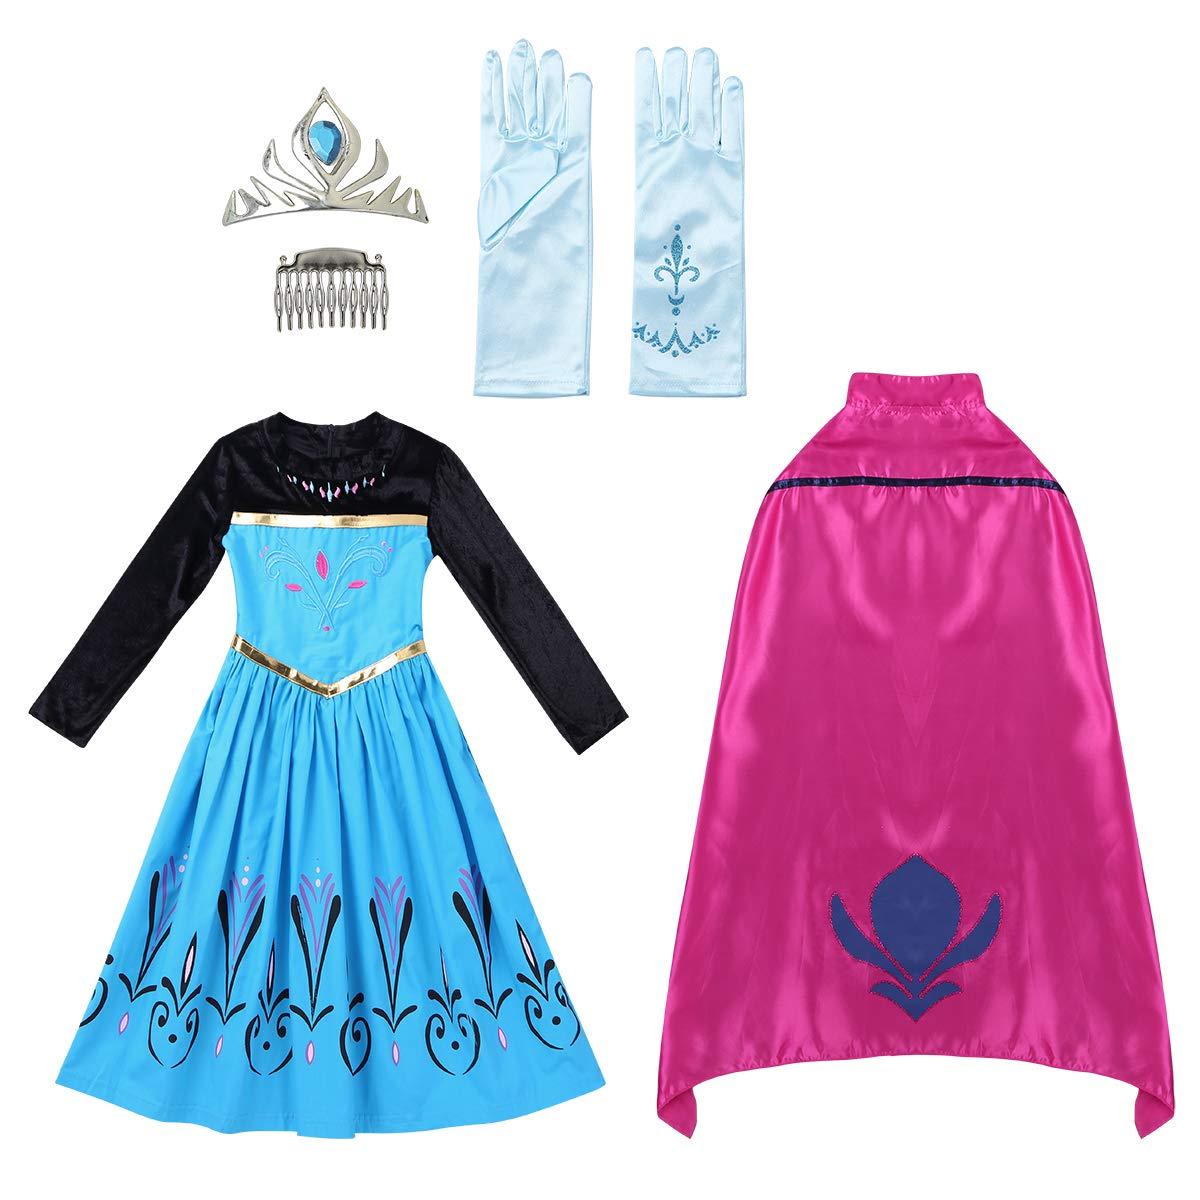 iiniim Vestido Princesa Azul Niña con Capa Diadema Guantes Tutú Infantil Fairy Tales Disfraces Reina Halloween Cosplay Costume Ceremonia Fancy Dress Accesorios para Niña Bebé